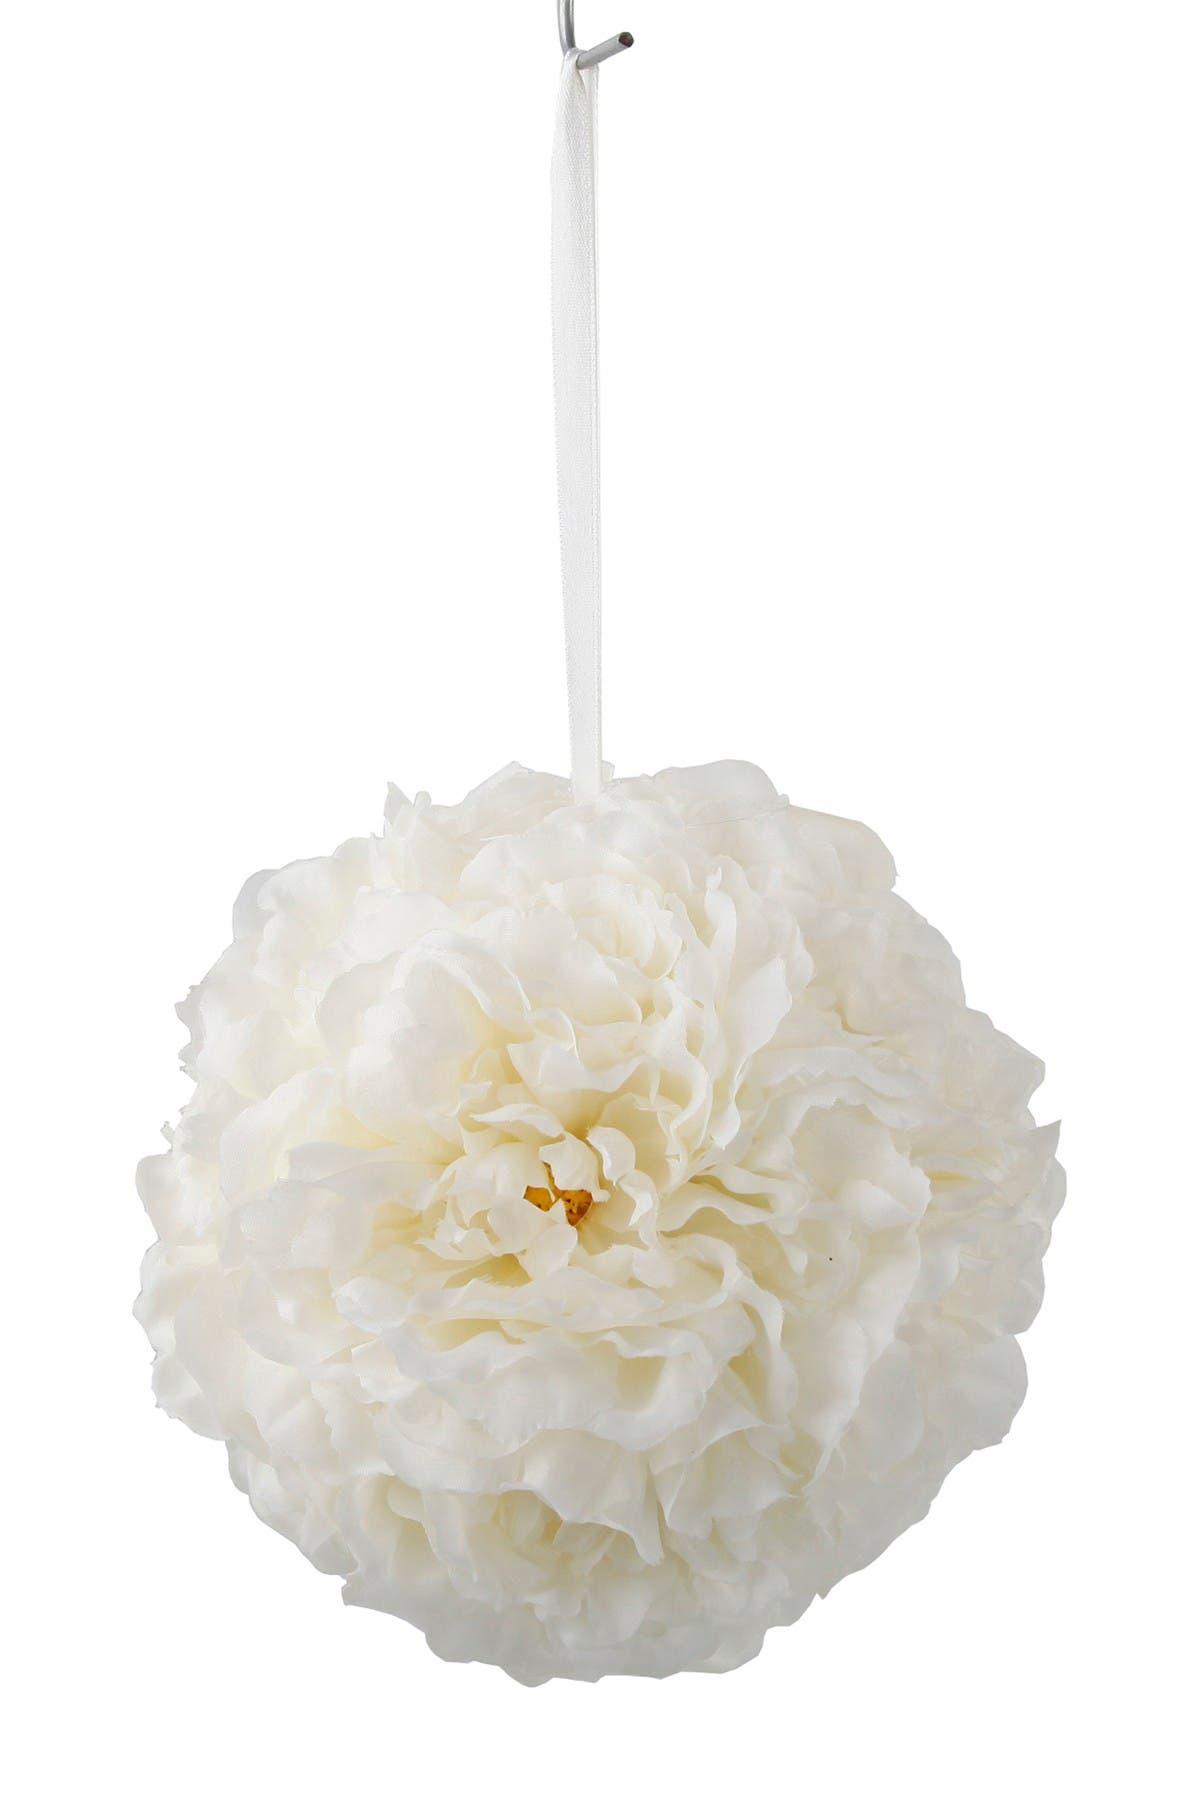 Image of FLORA BUNDA Cream Kissing Ball